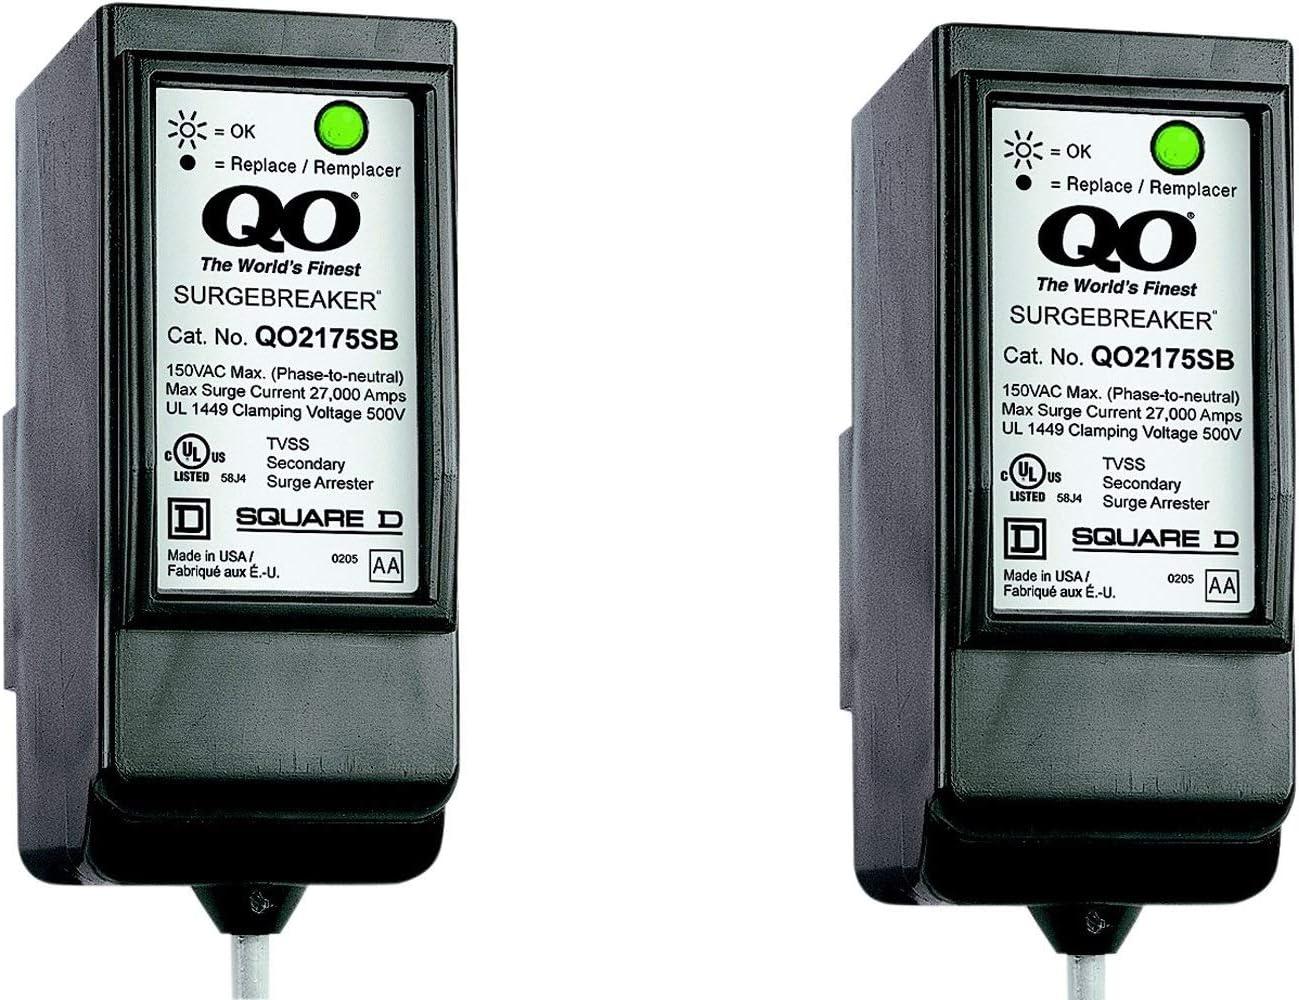 Square D QO Surgebreaker Surge Protective Device Takes 2 Load Center Spaces